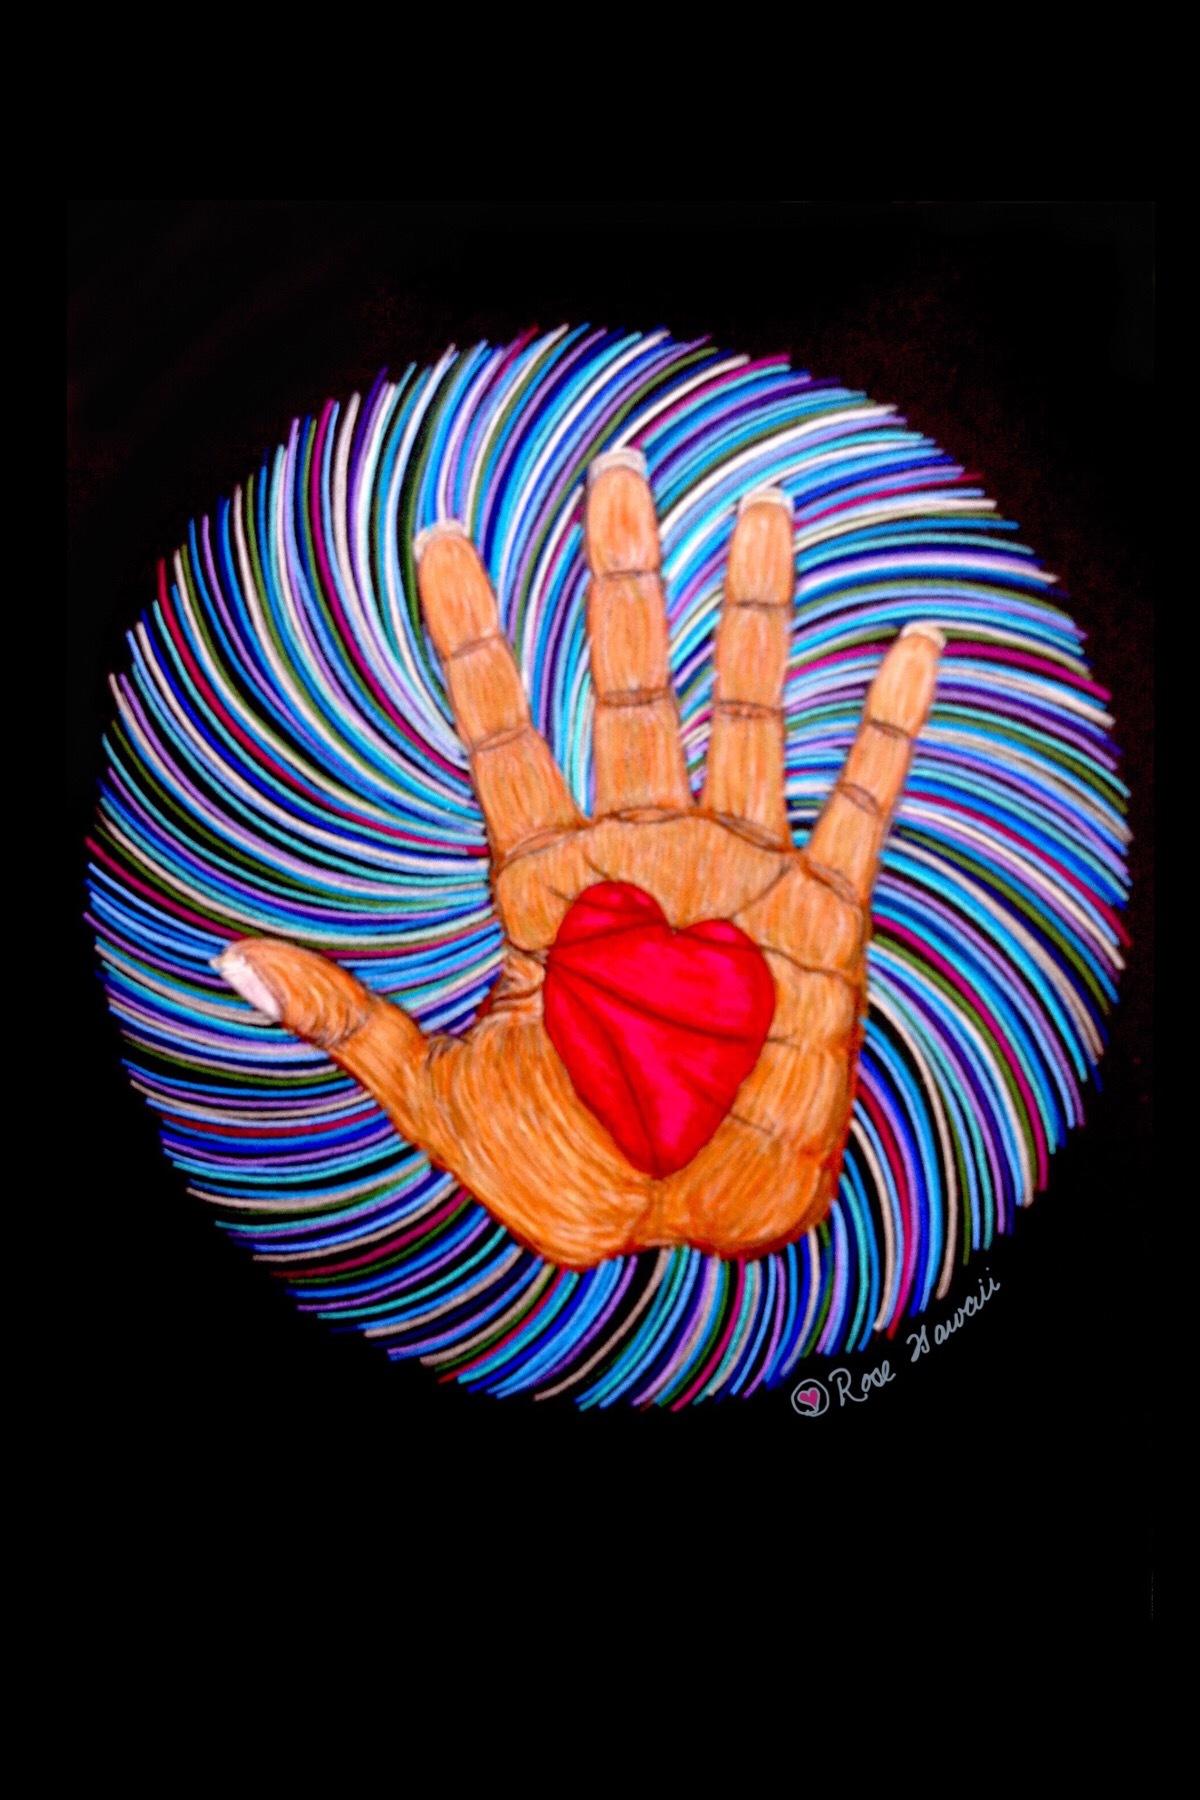 Intuitive Healing Hands energies on black